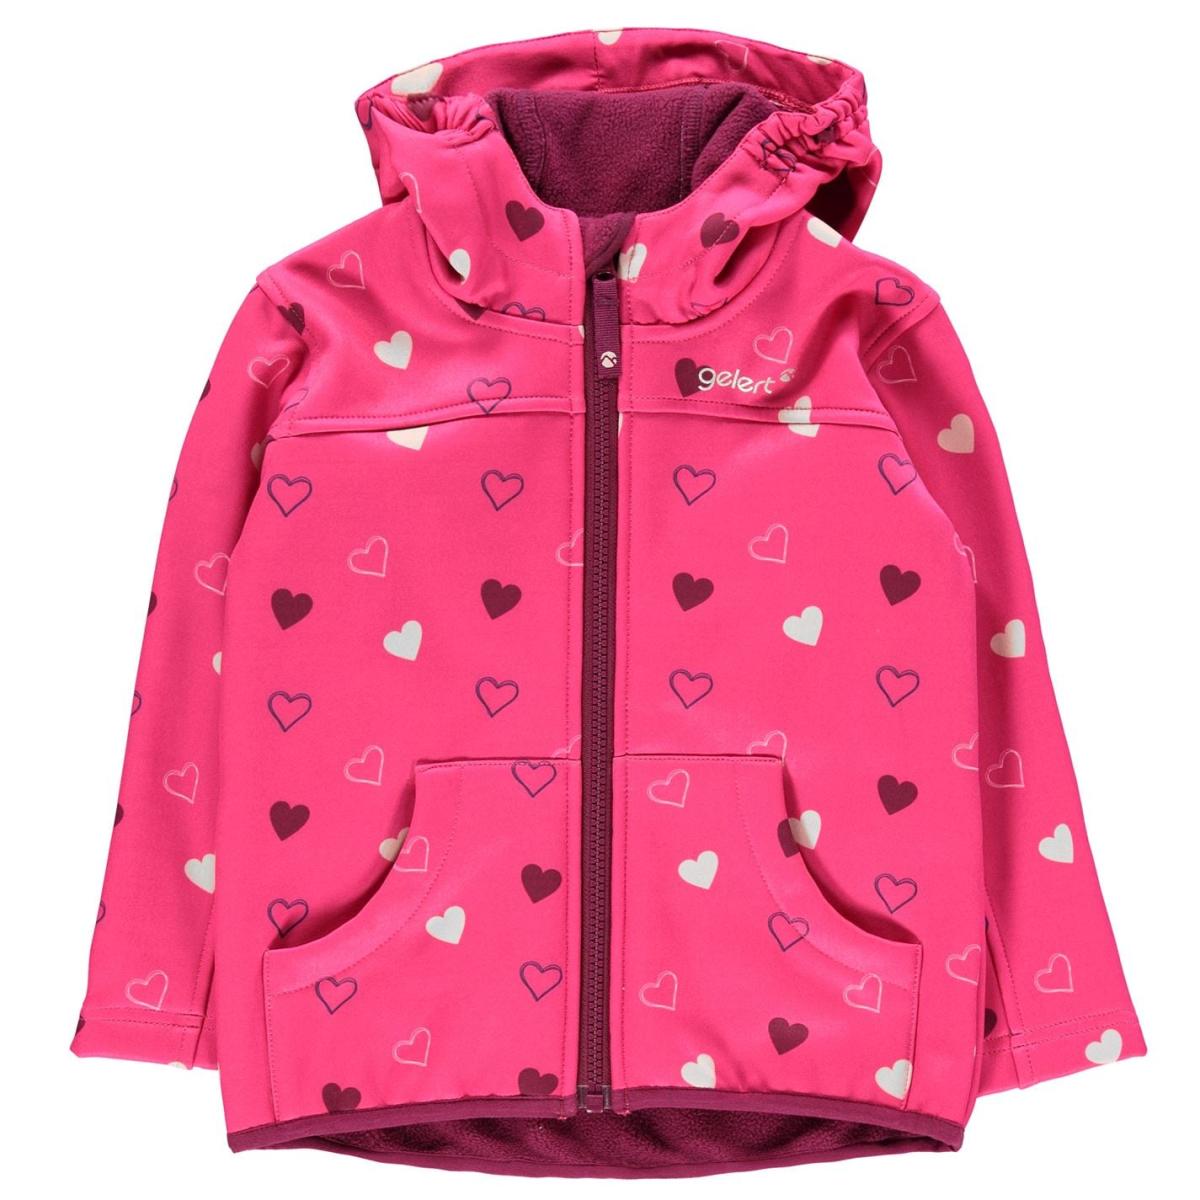 Gelert Softshell Jacke Kinder Jungen Herbst Frühling Leichtgewicht Casual 8000 Pink_Hearts